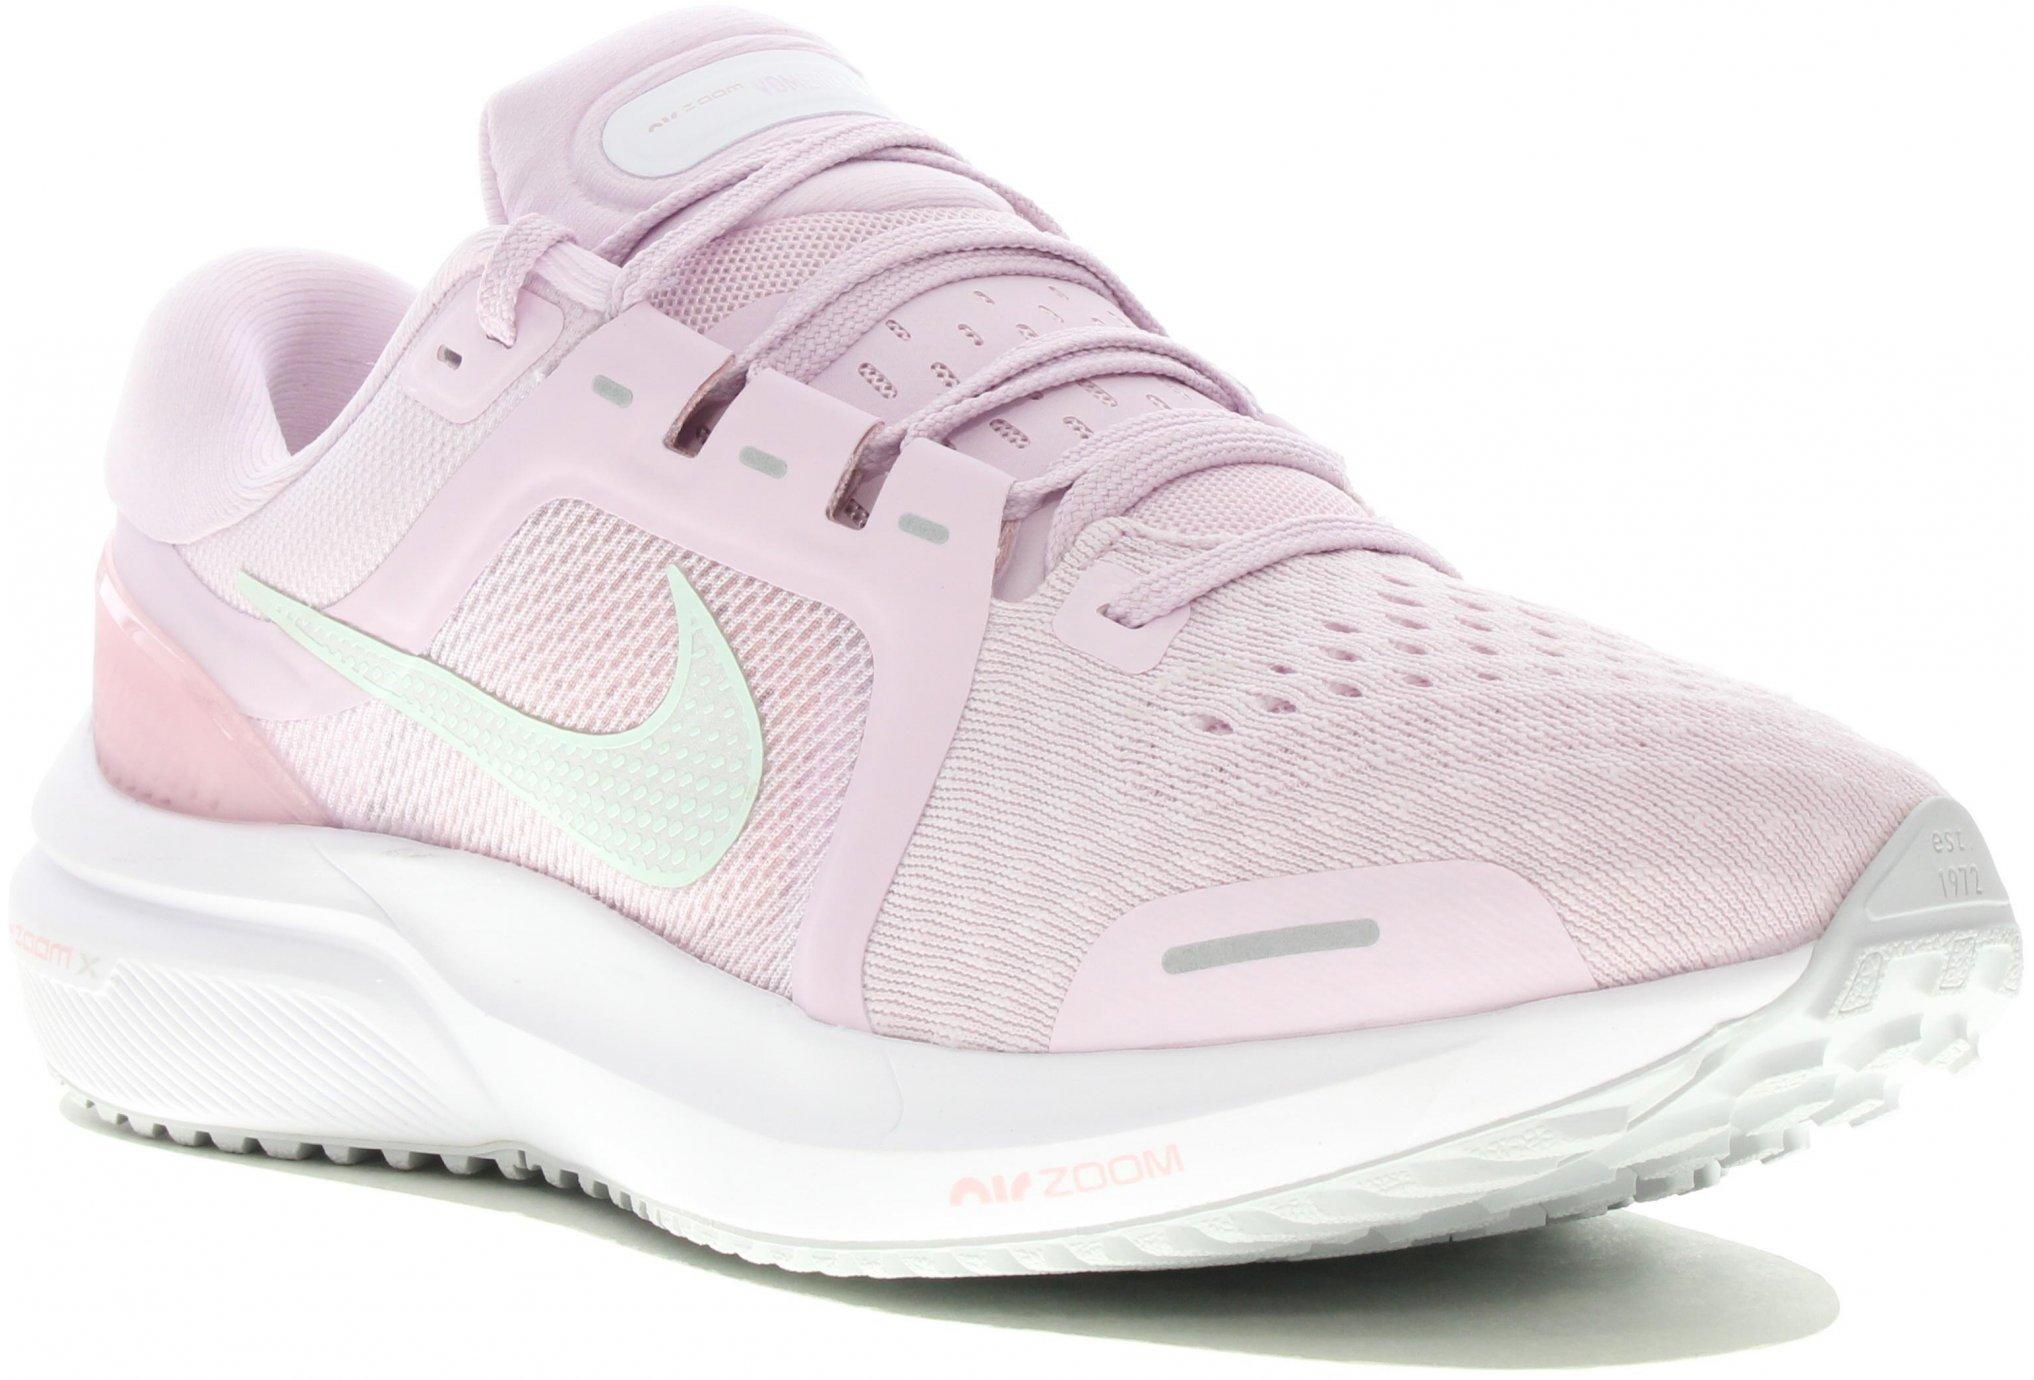 Nike Air Zoom Vomero 16 W Chaussures running femme